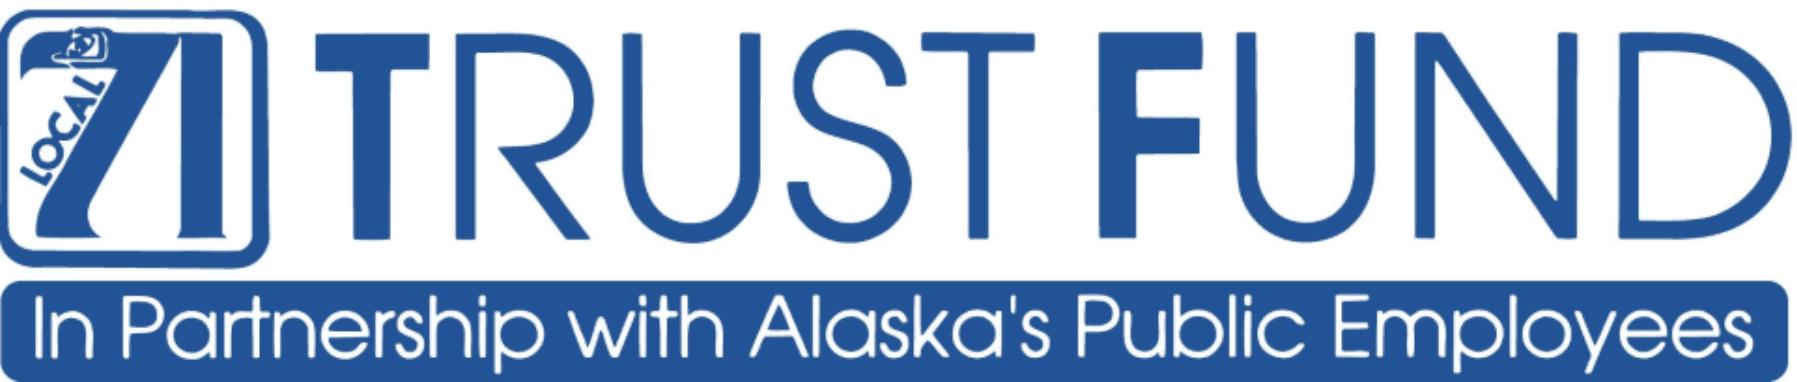 PE 71 Trust Logo.png